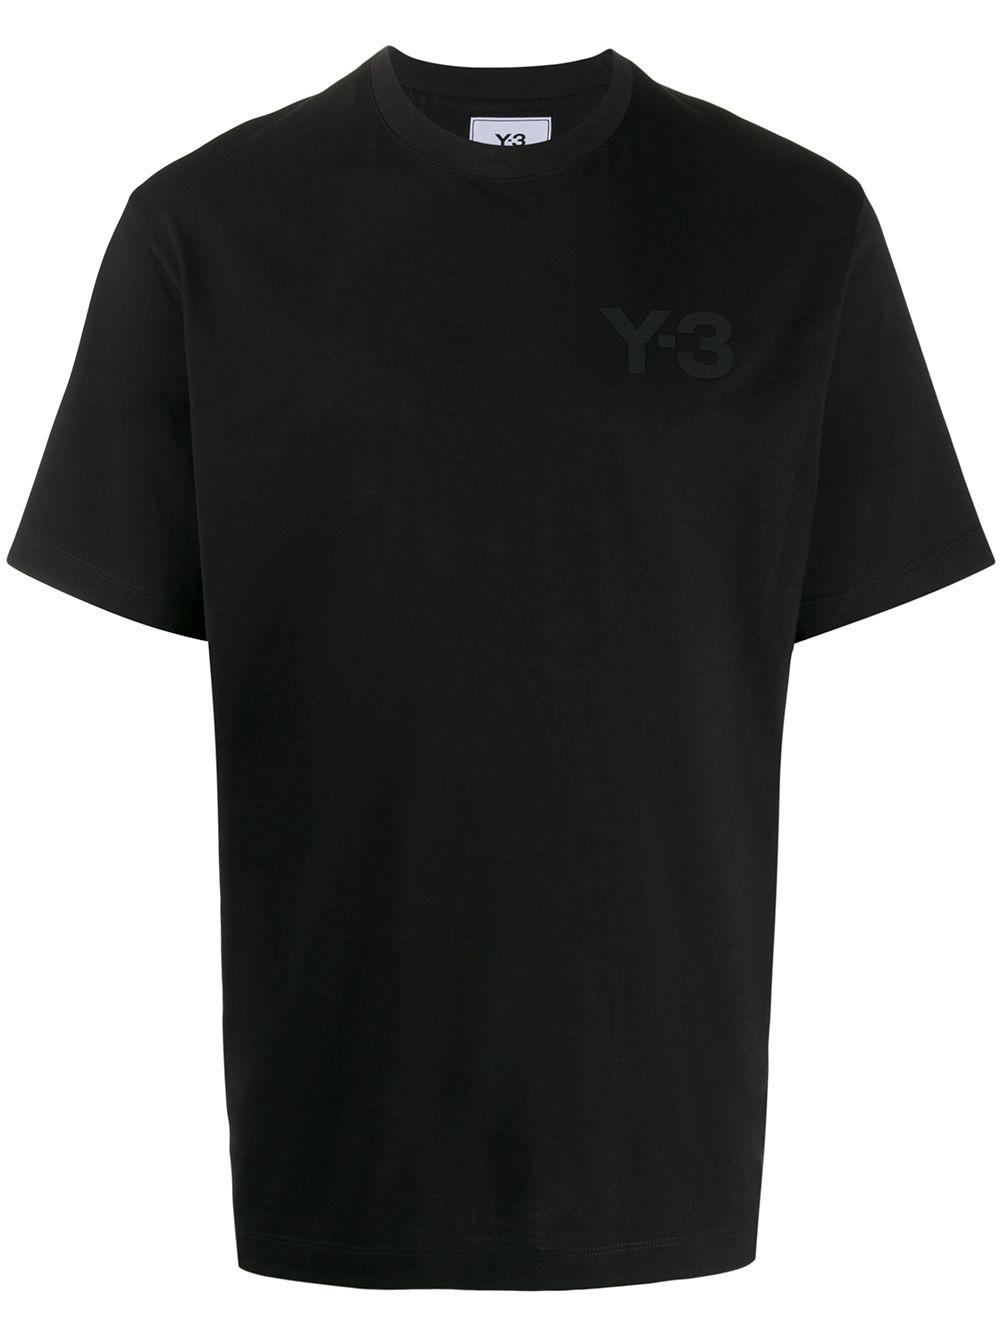 logo t-shirt man black in cotton Y-3   T-shirts   FN3358BLACK